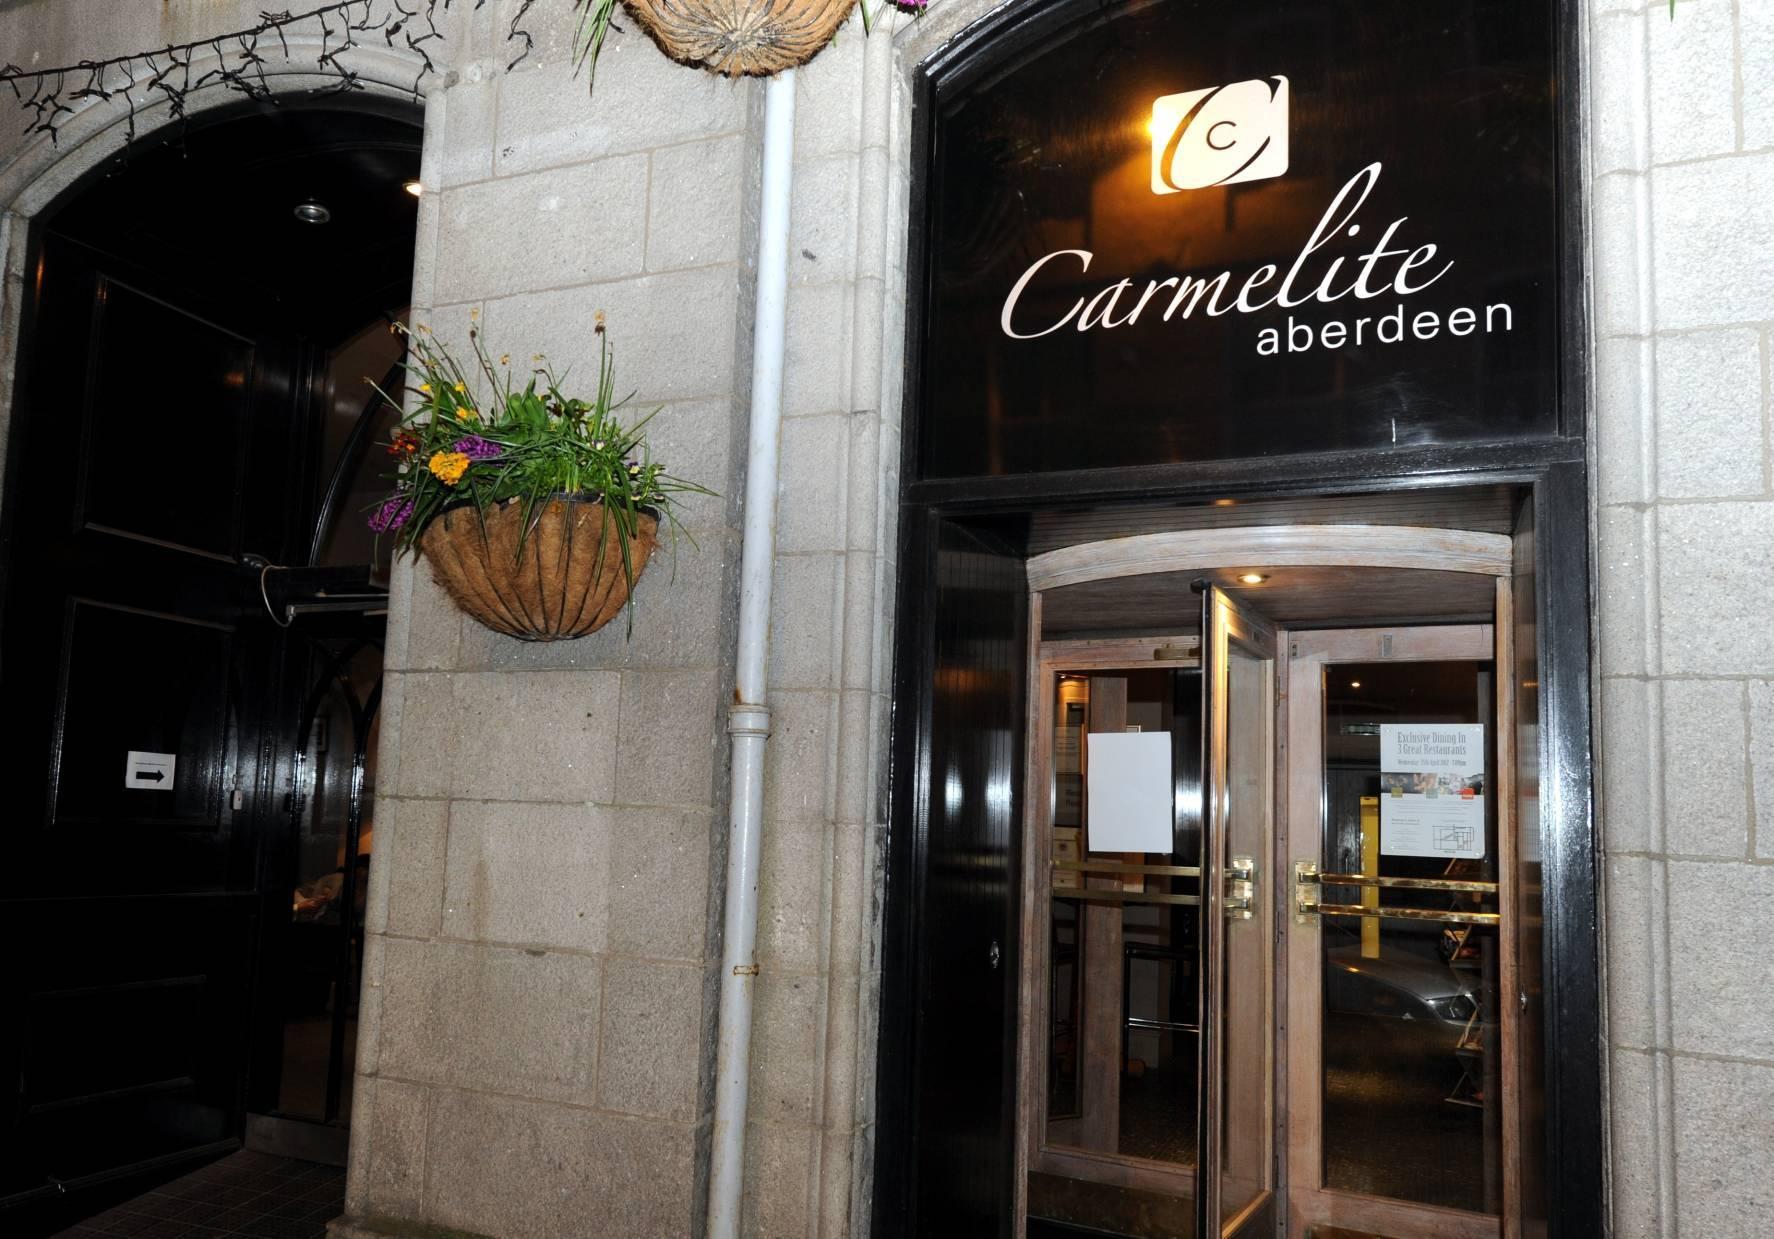 The Carmelite Hotel